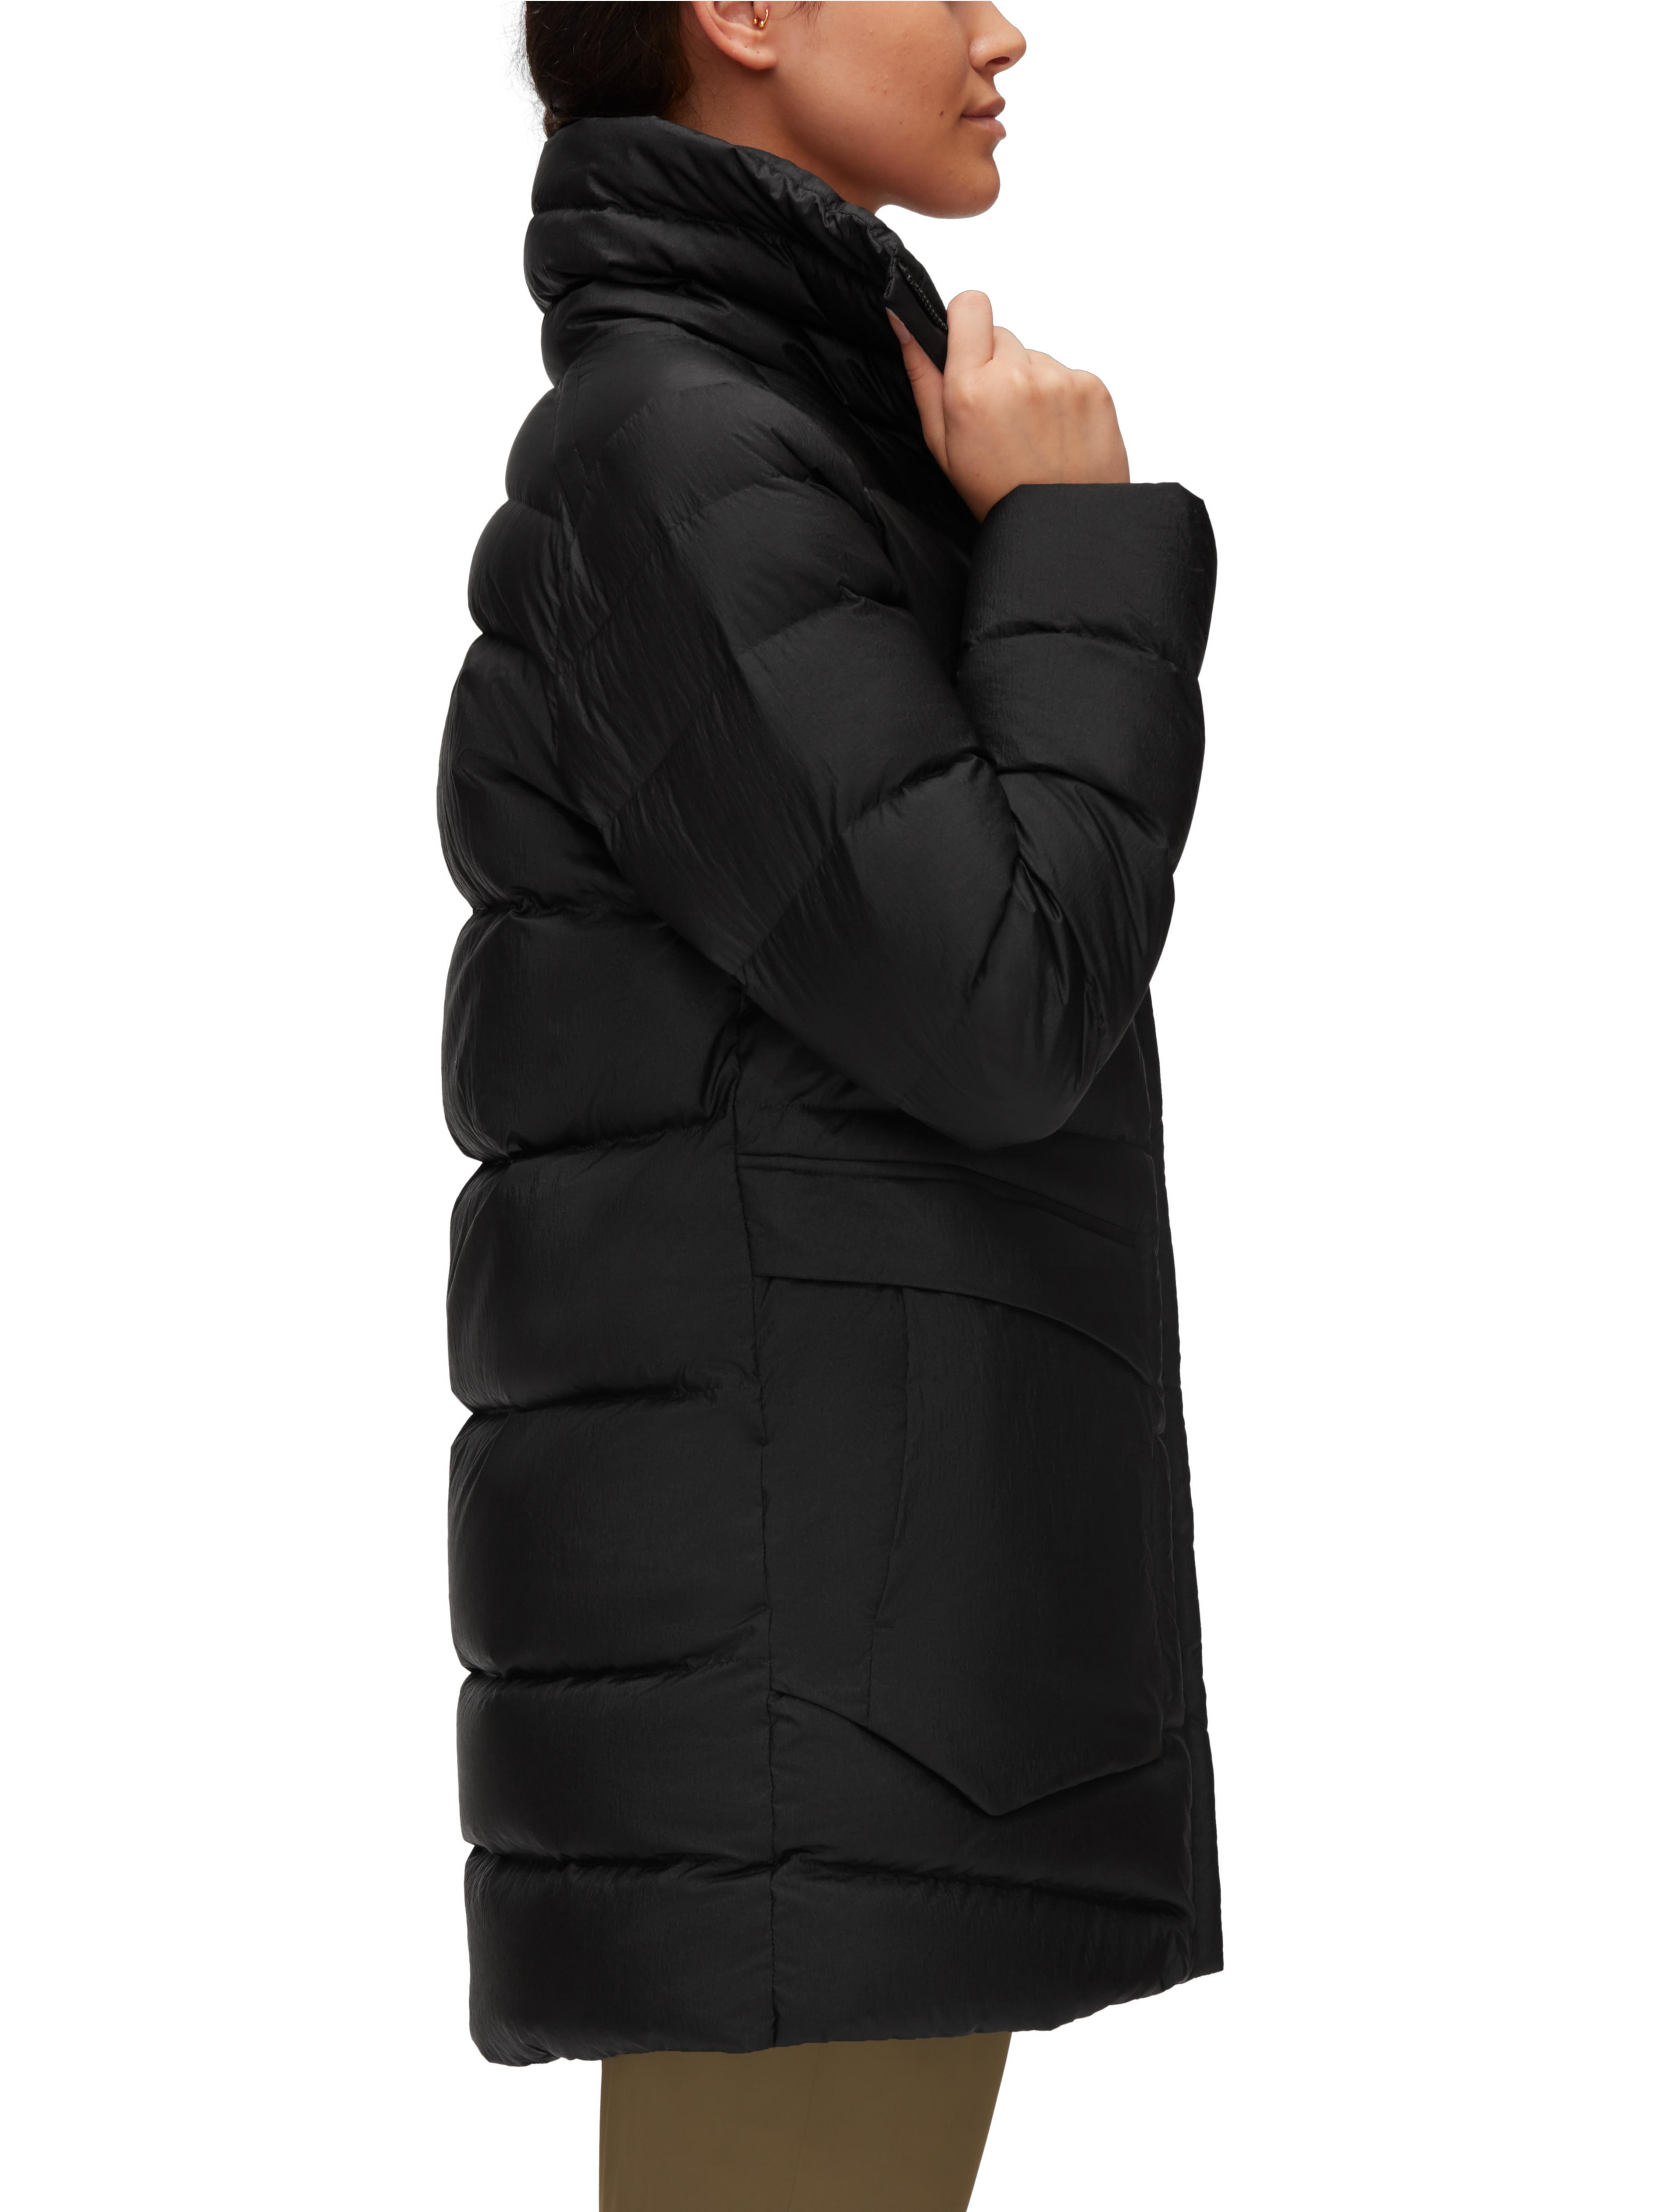 Uetliberg IN Jacket Women thumbnail